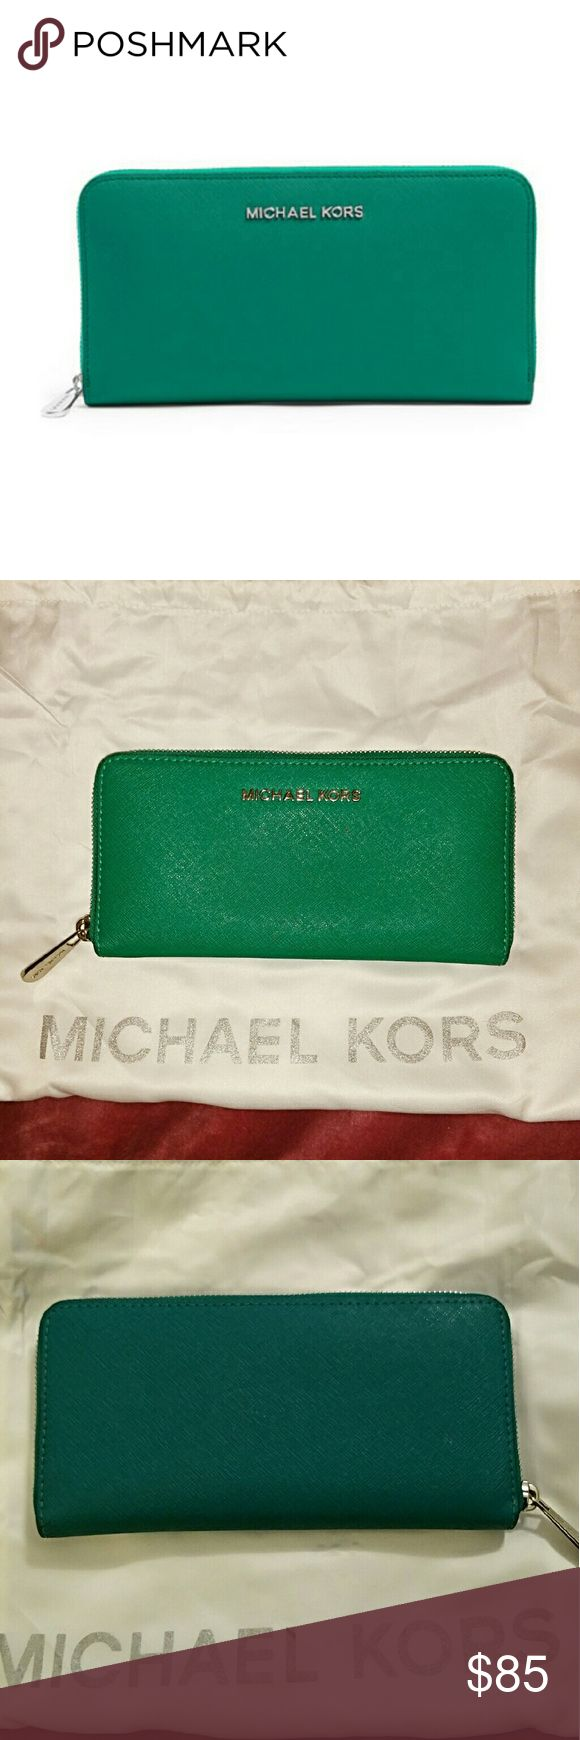 Michael kors jet set wallet Aqua color jet set wallet authentic, silver hardware. In new condition KORS Michael Kors Bags Wallets